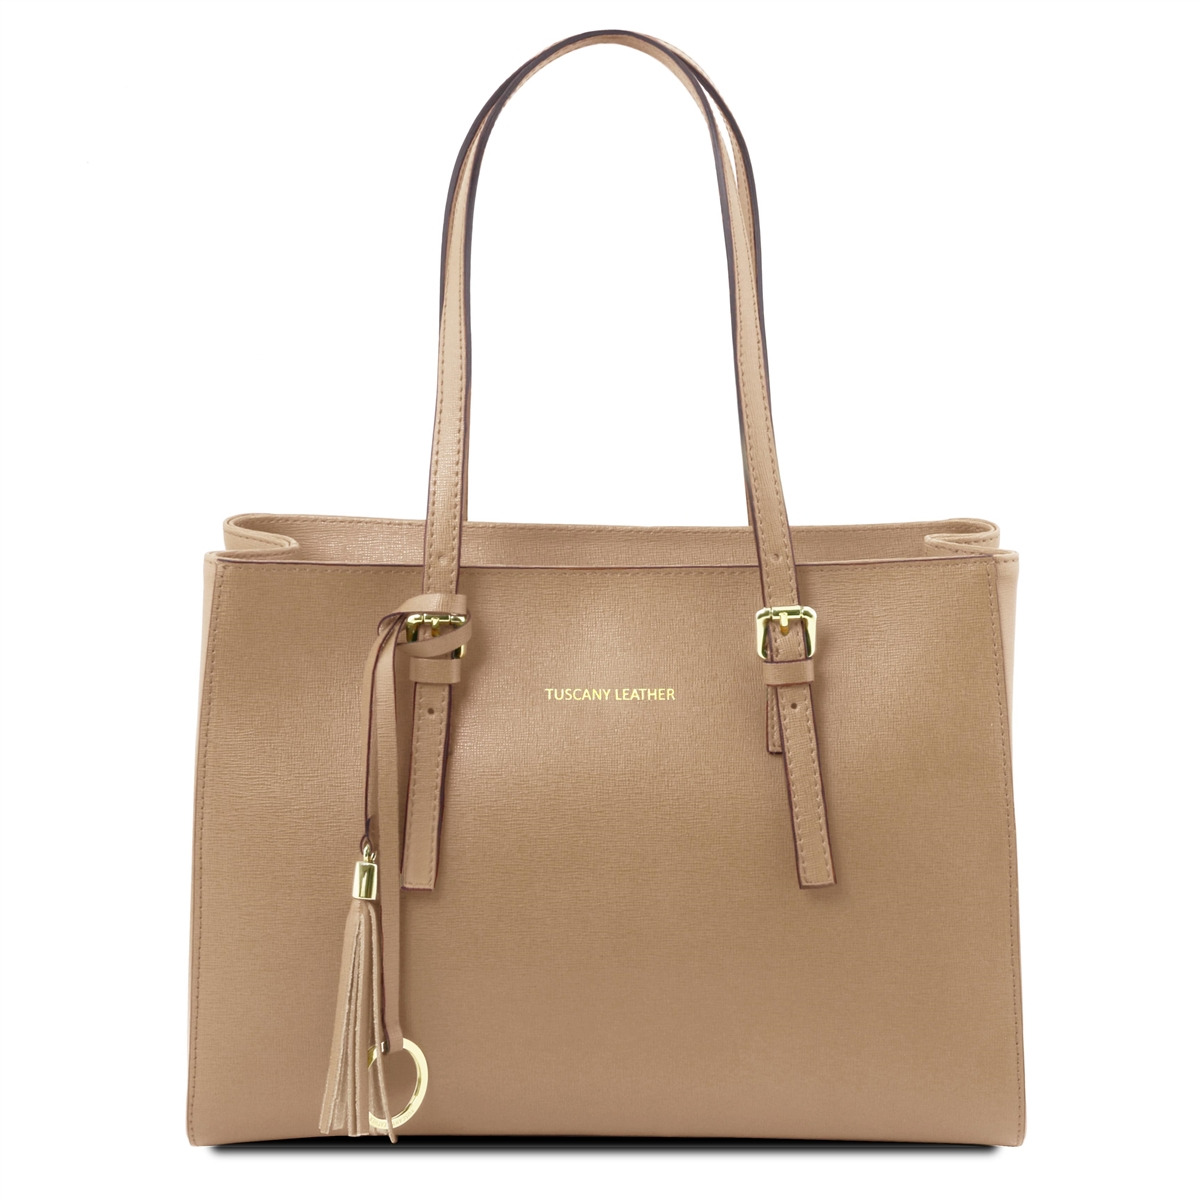 Handbag Leather Tl Caramel Saffiano Tl141518 xIwtERqR